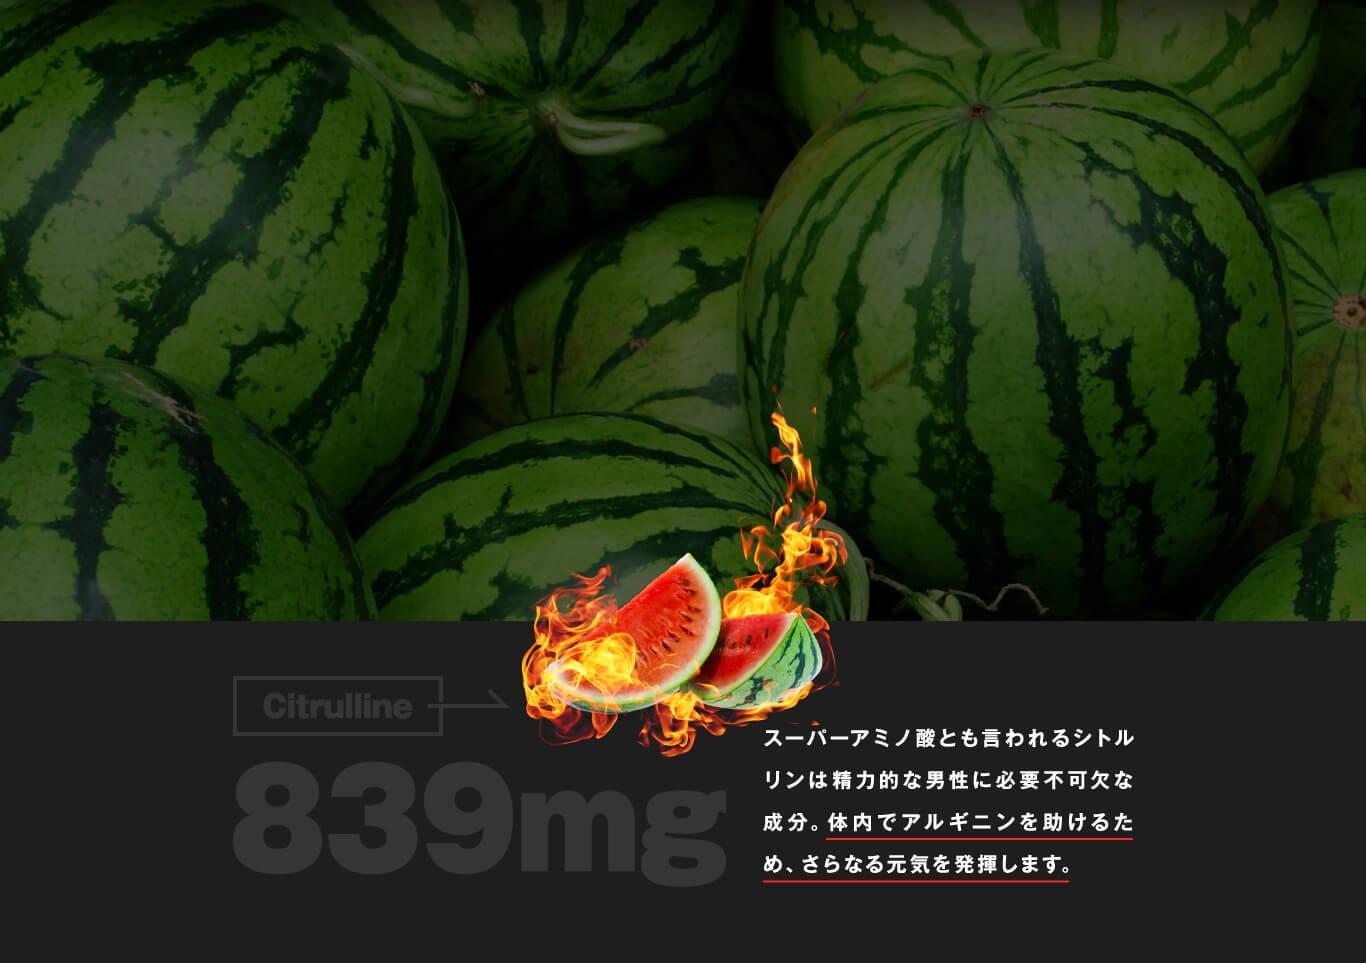 Citrulline 839mg